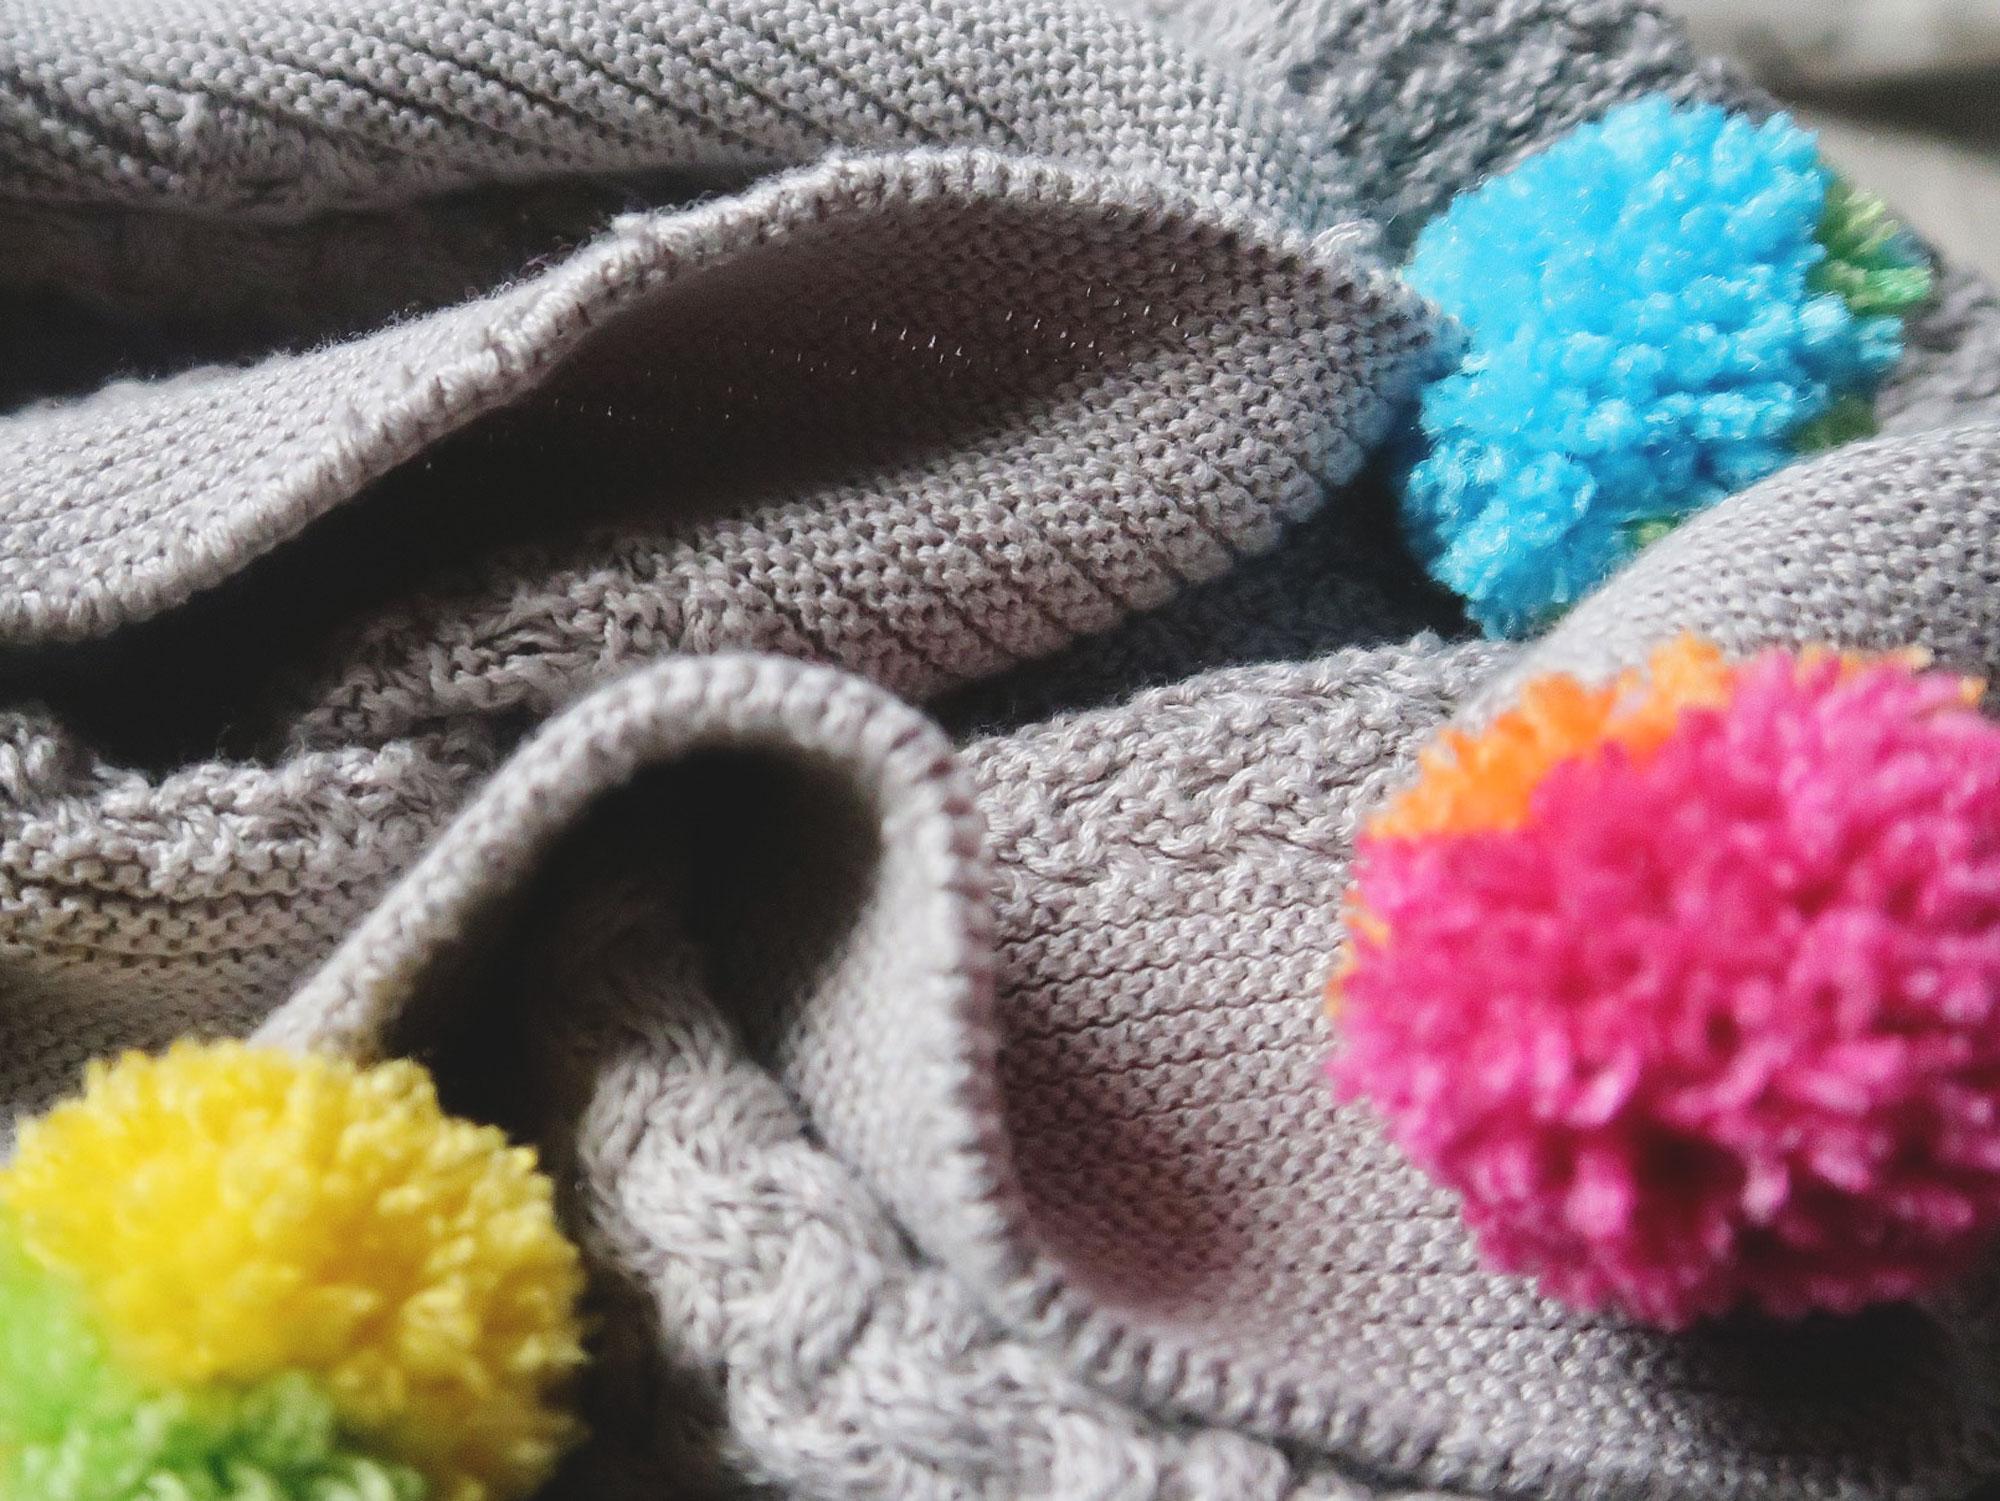 pom_pom_making_blanket_close_up